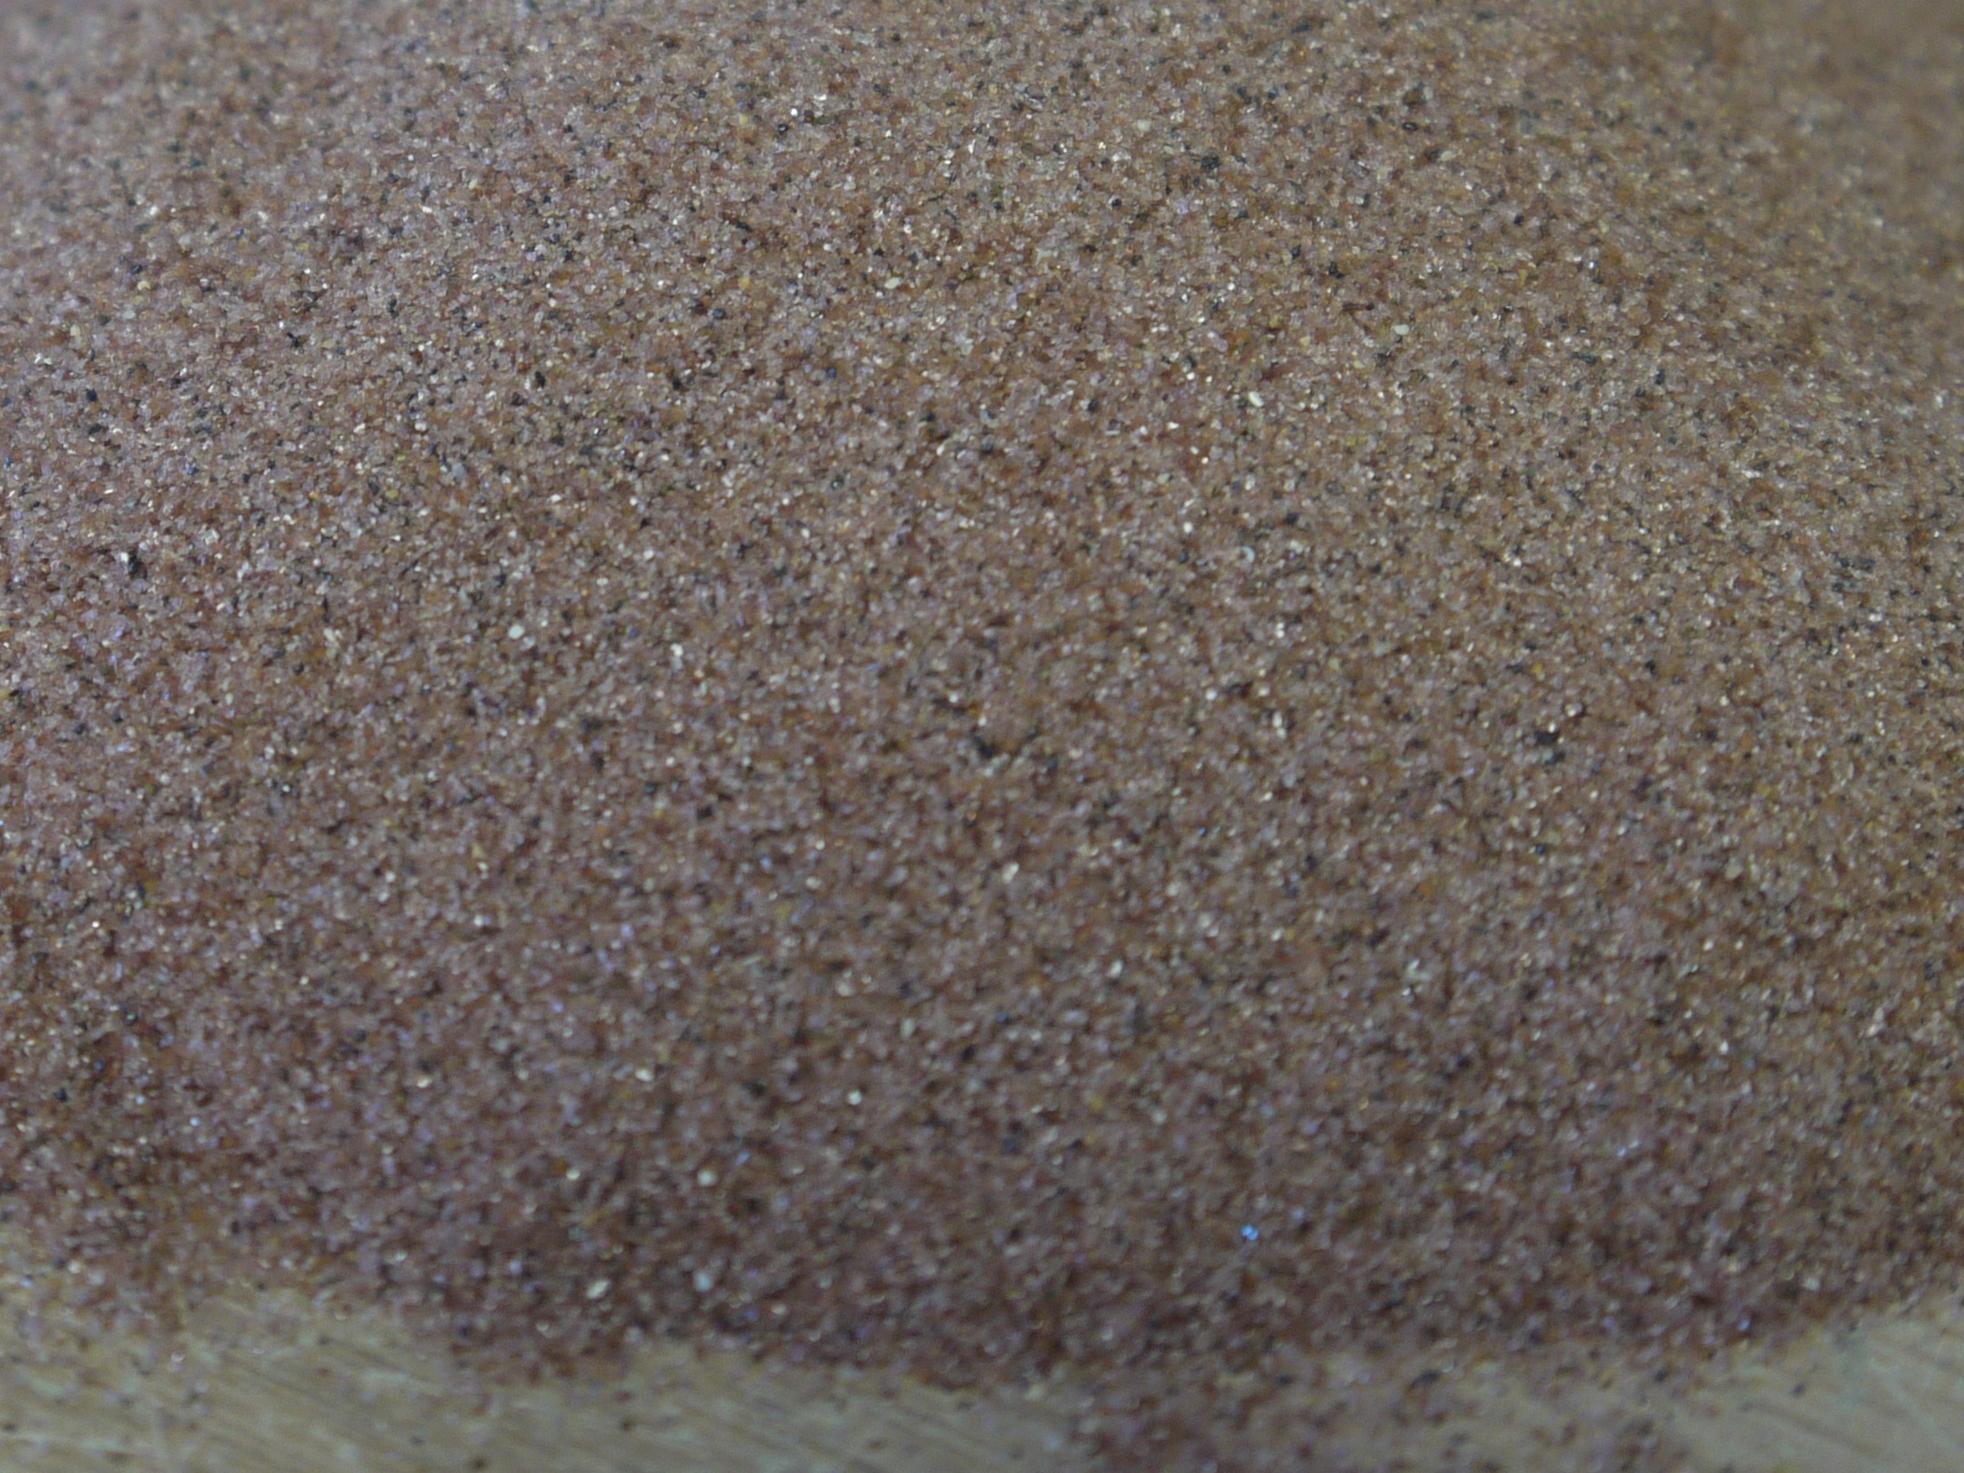 Calcium Aluminate Msds : Data sheets key abrasives part